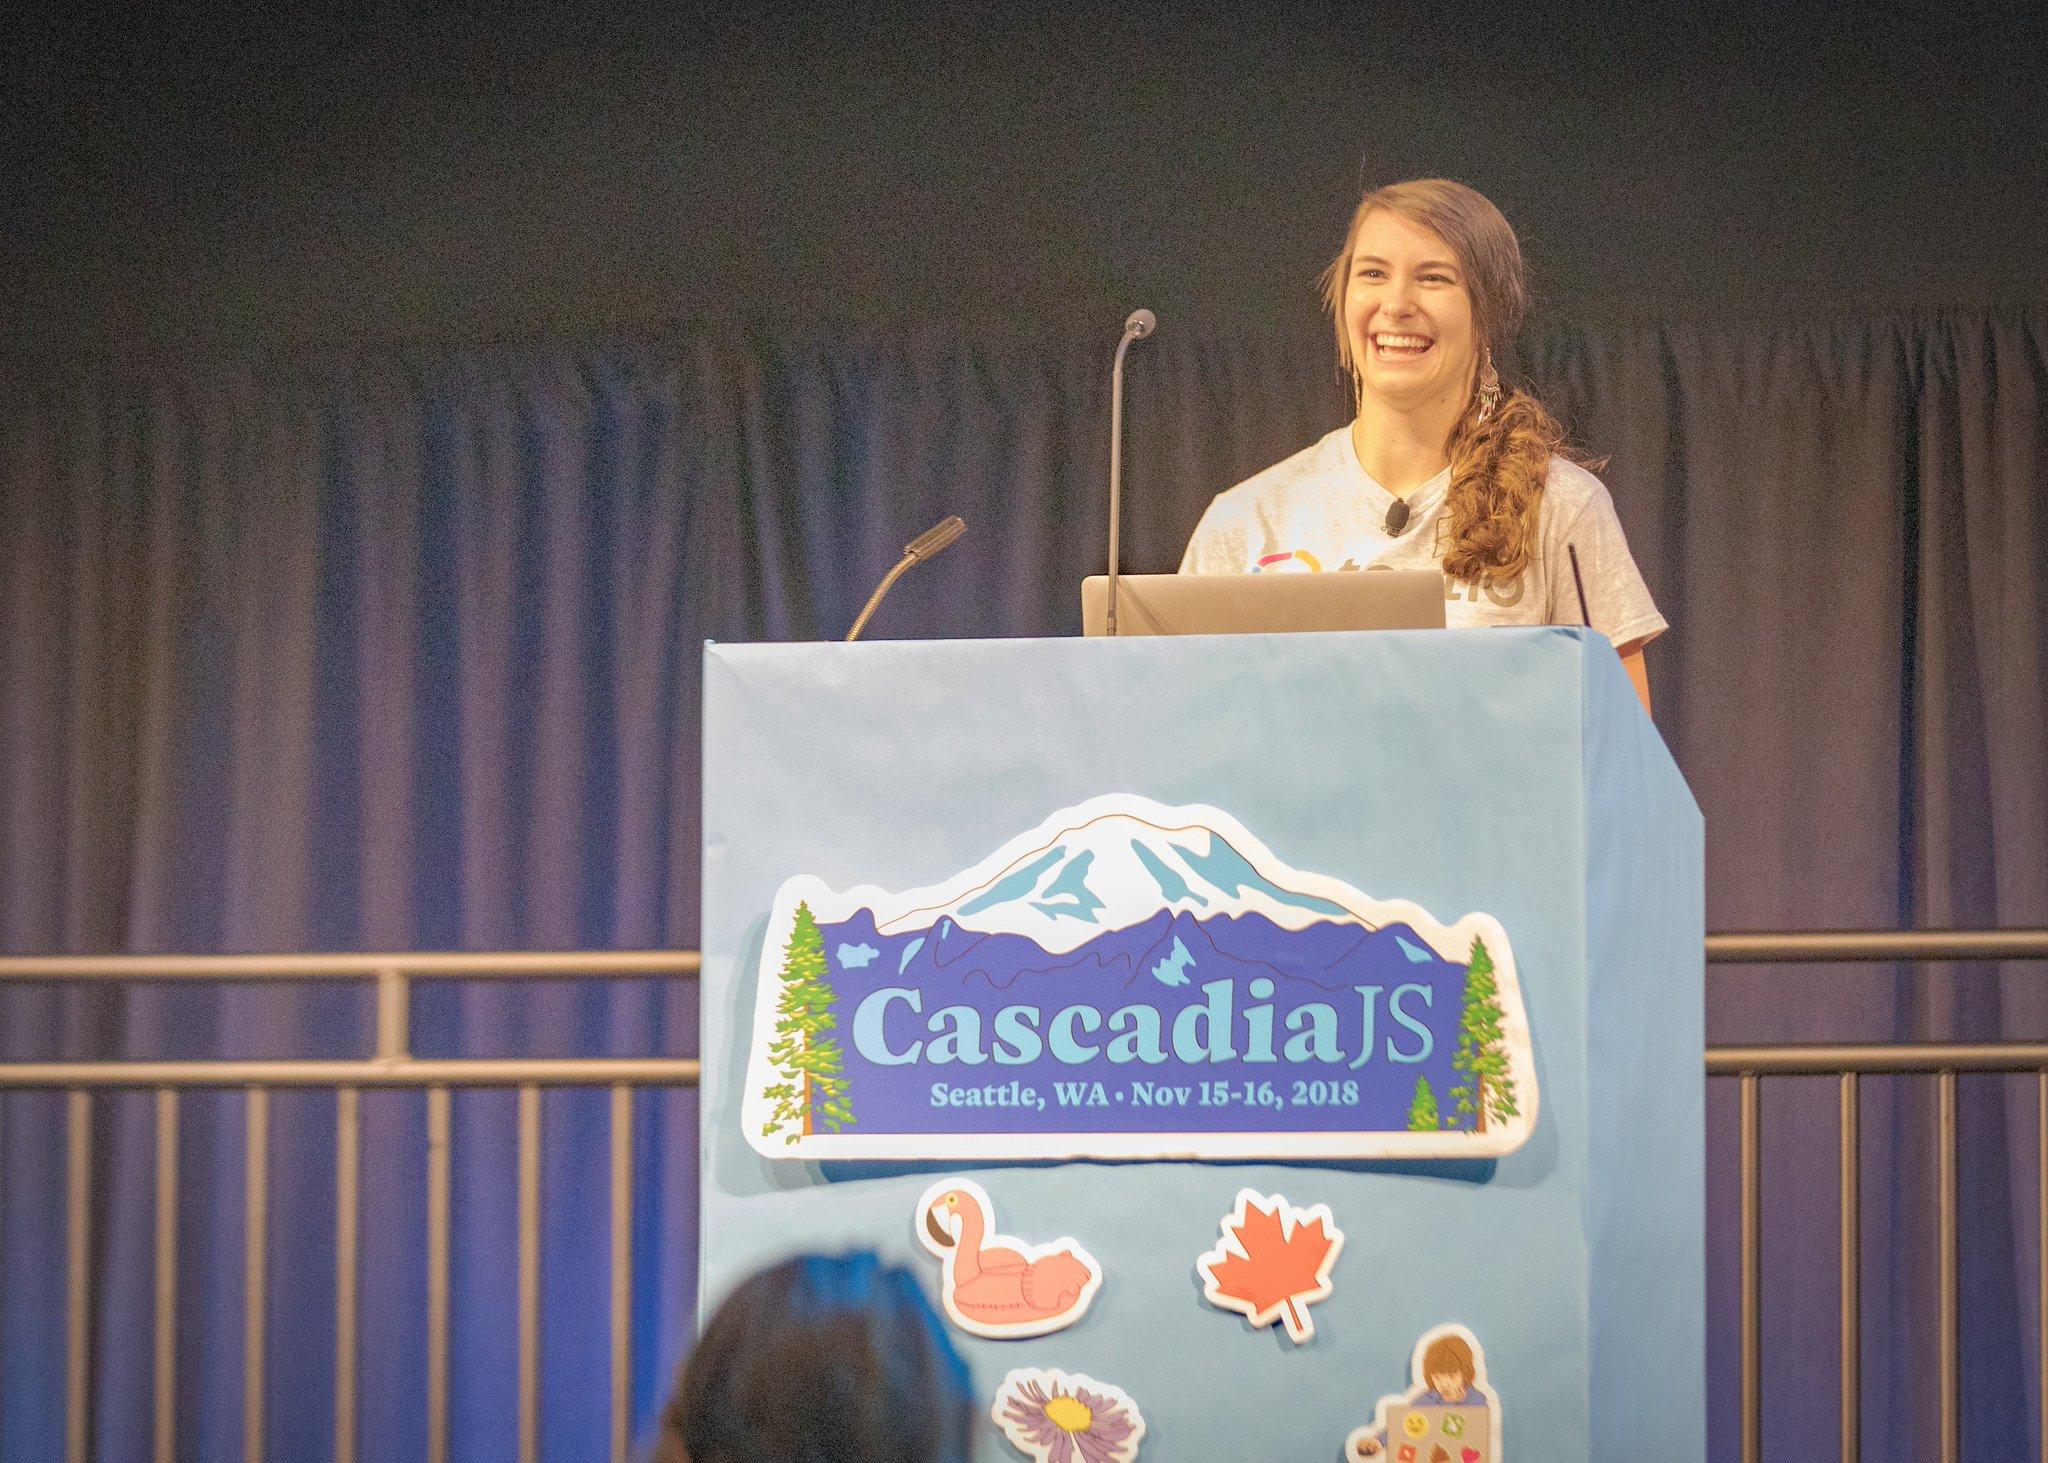 CascadiaJS 2018 speaker